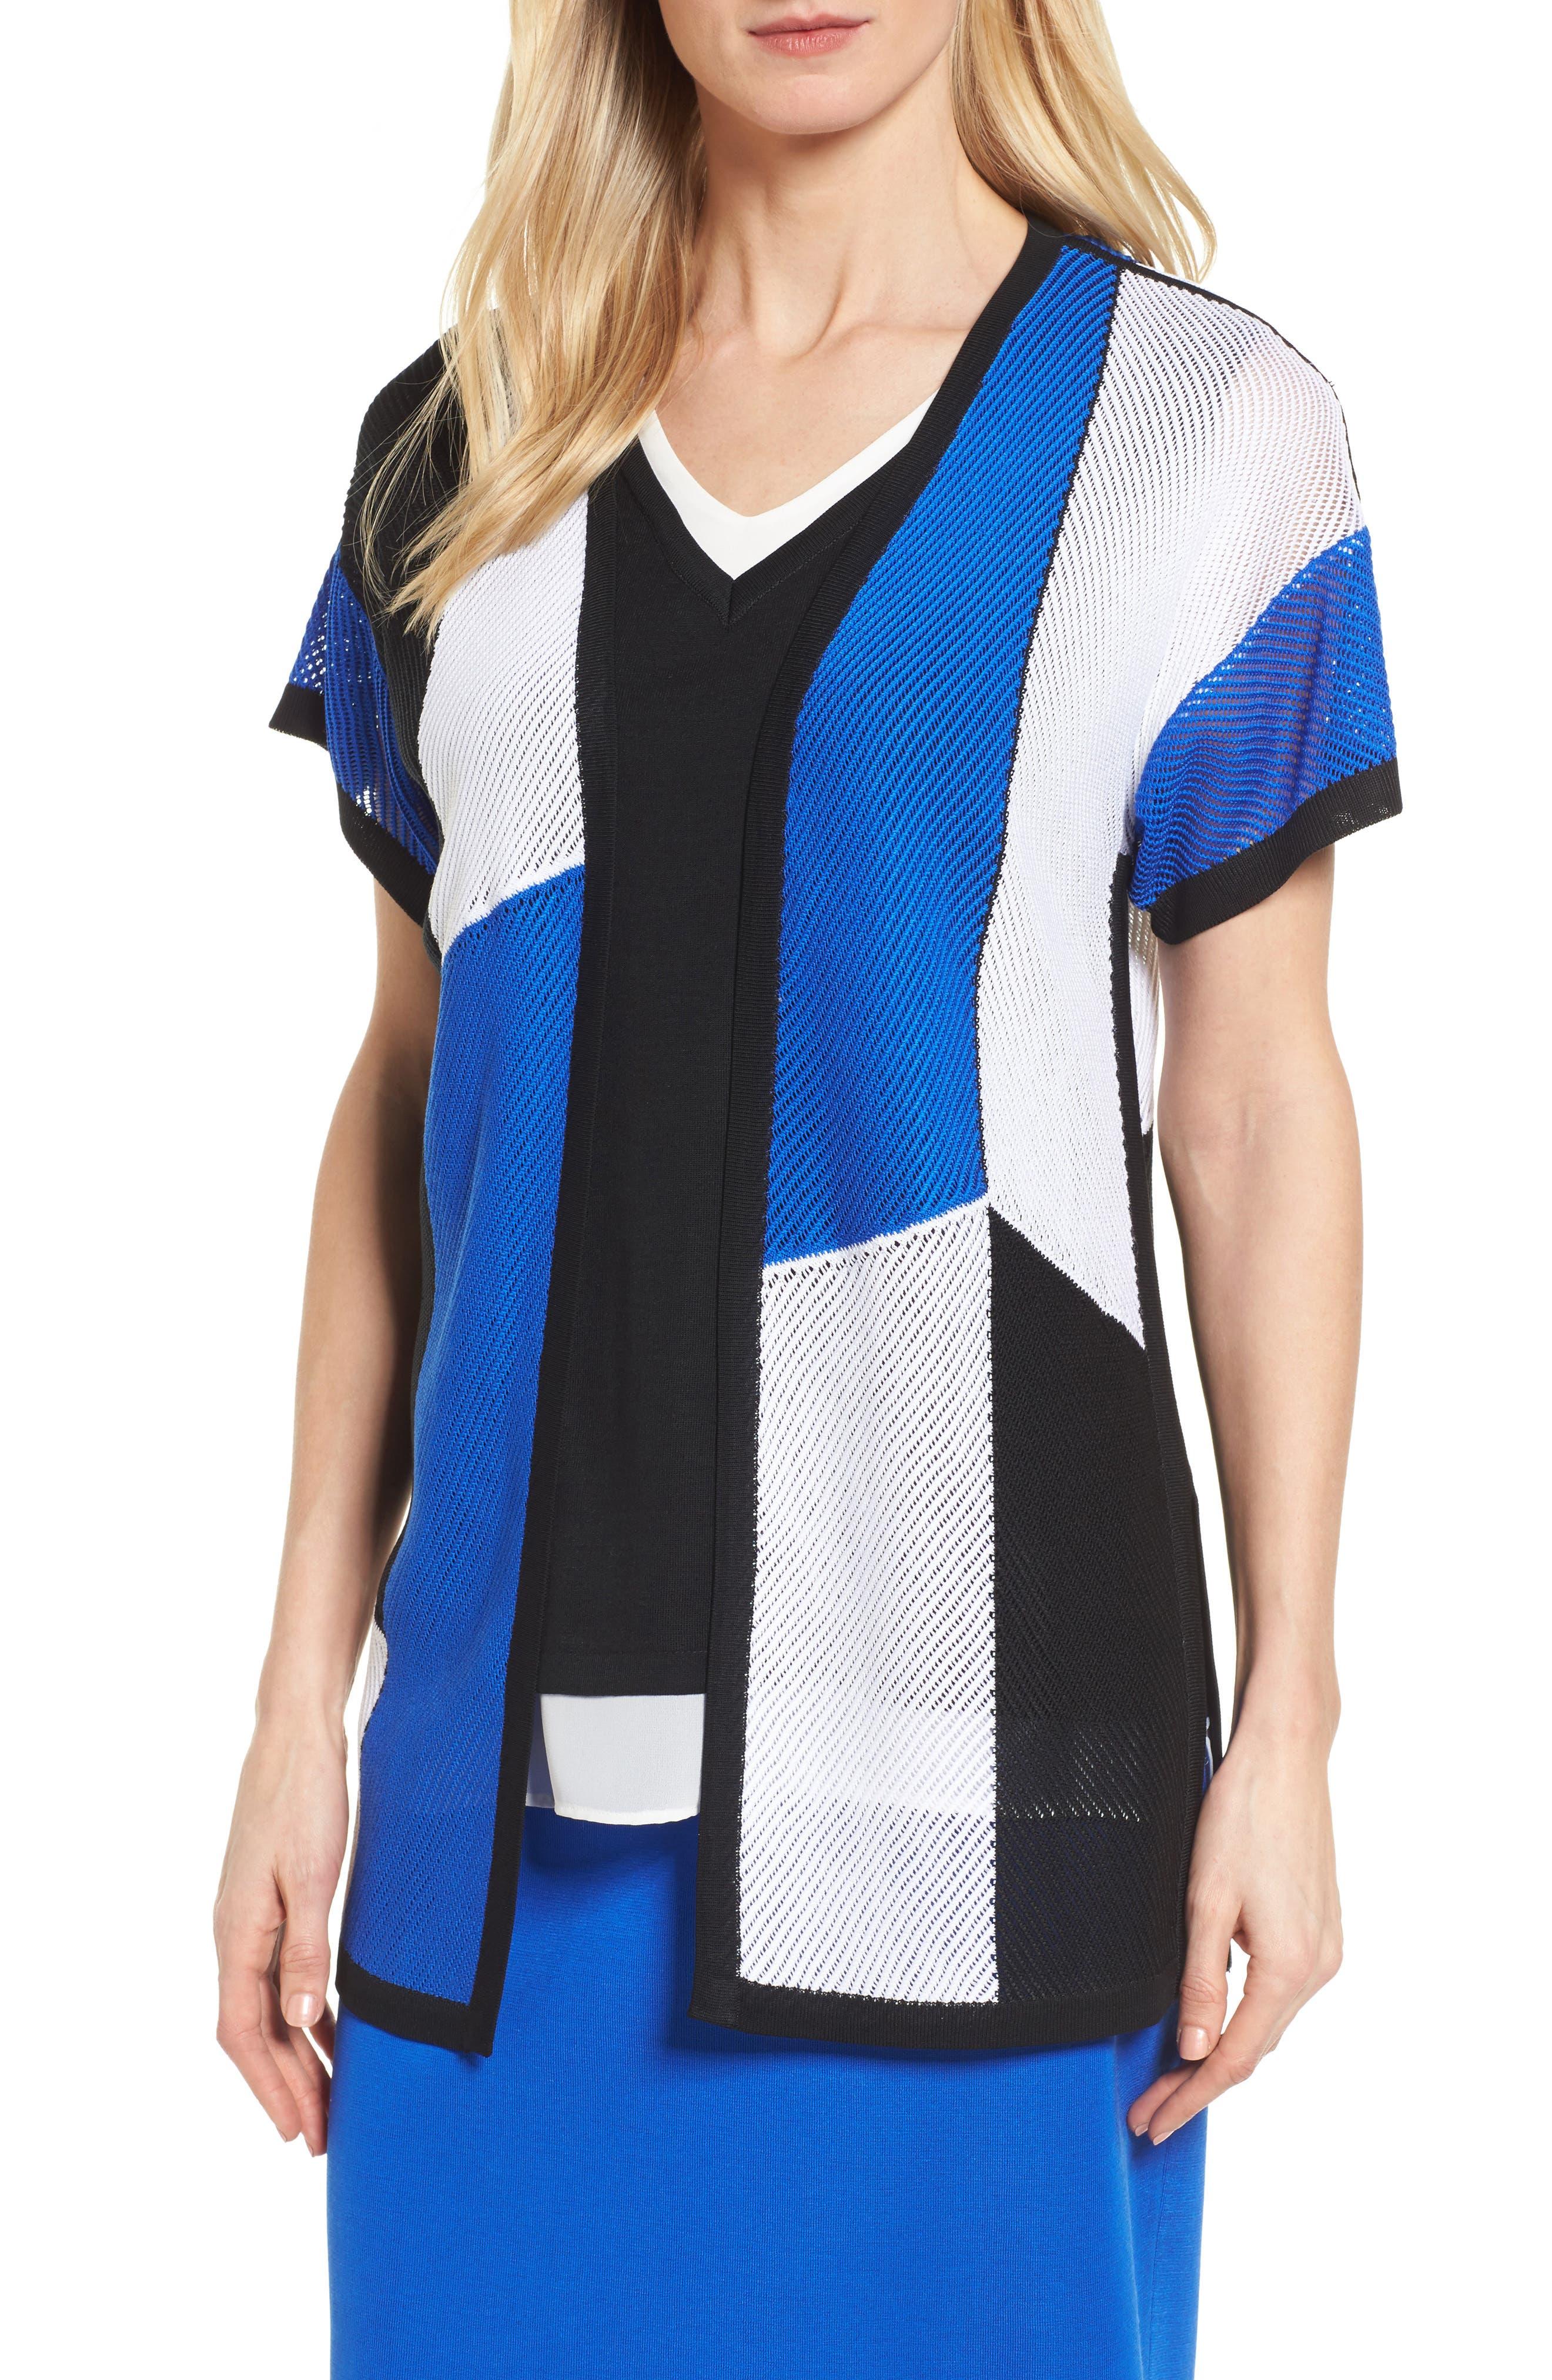 Colorblock Short Sleeve Cardigan,                             Main thumbnail 1, color,                             White/ Black/ Patriot Blue